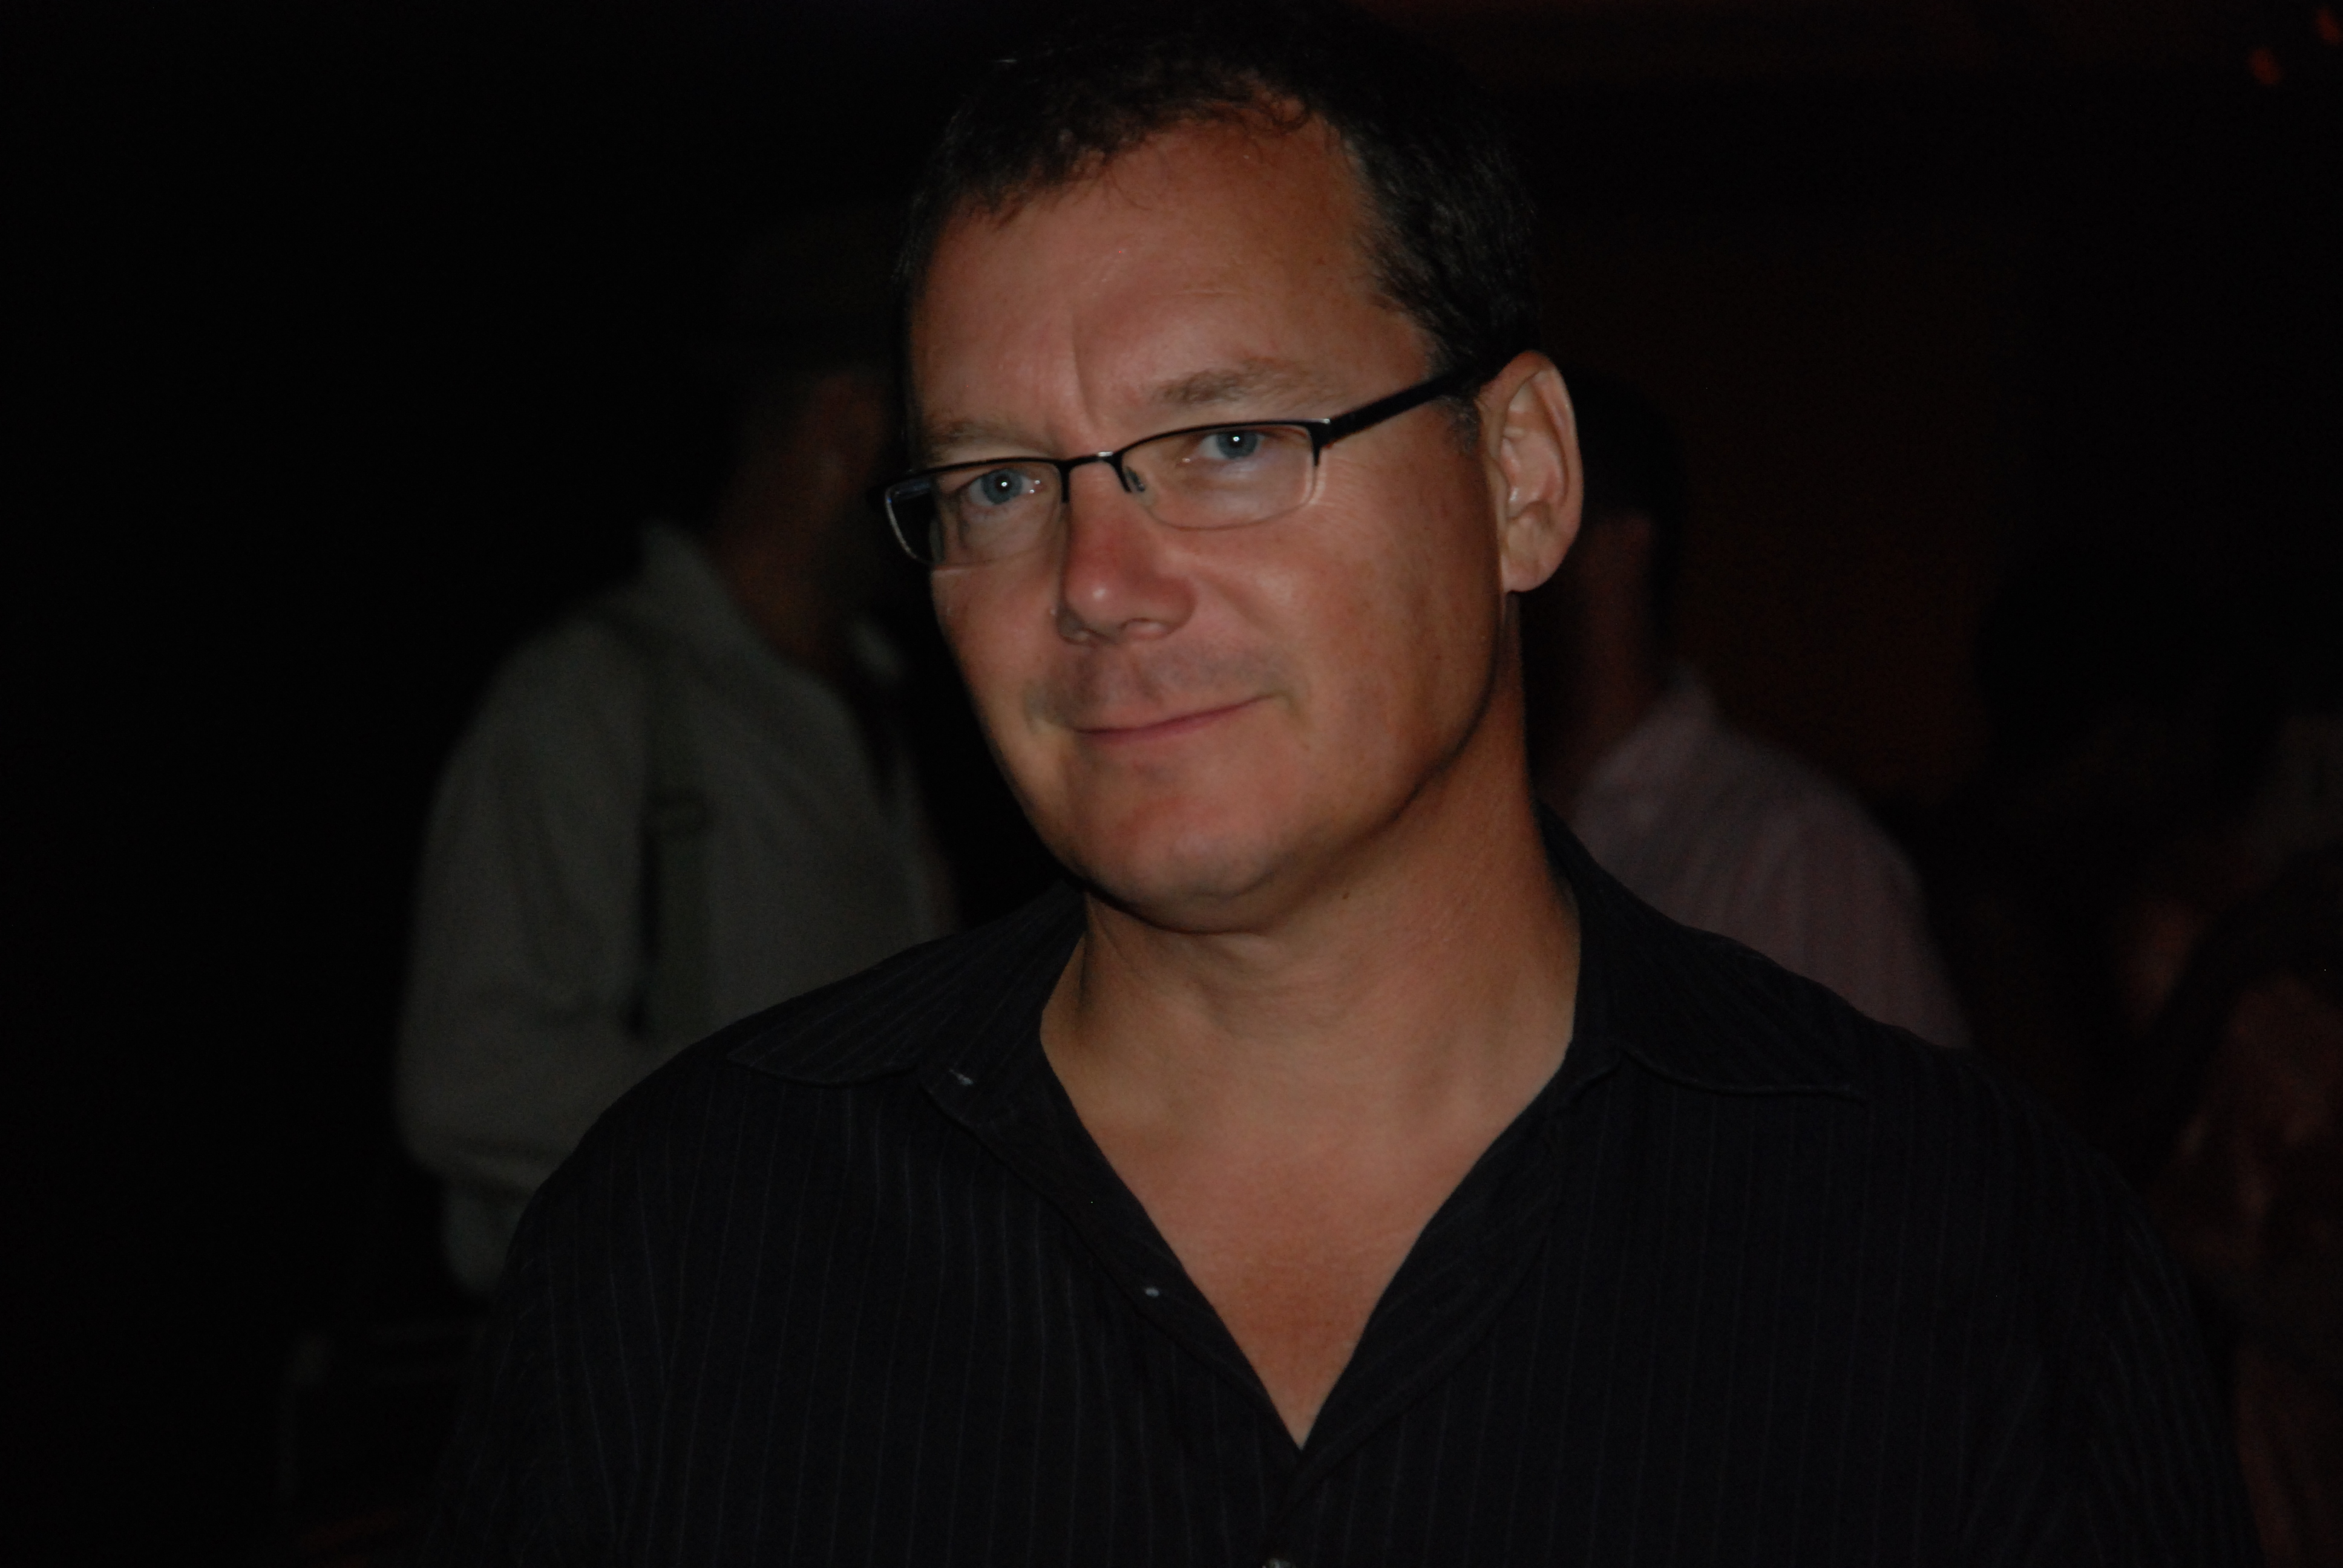 Sean Mullaney